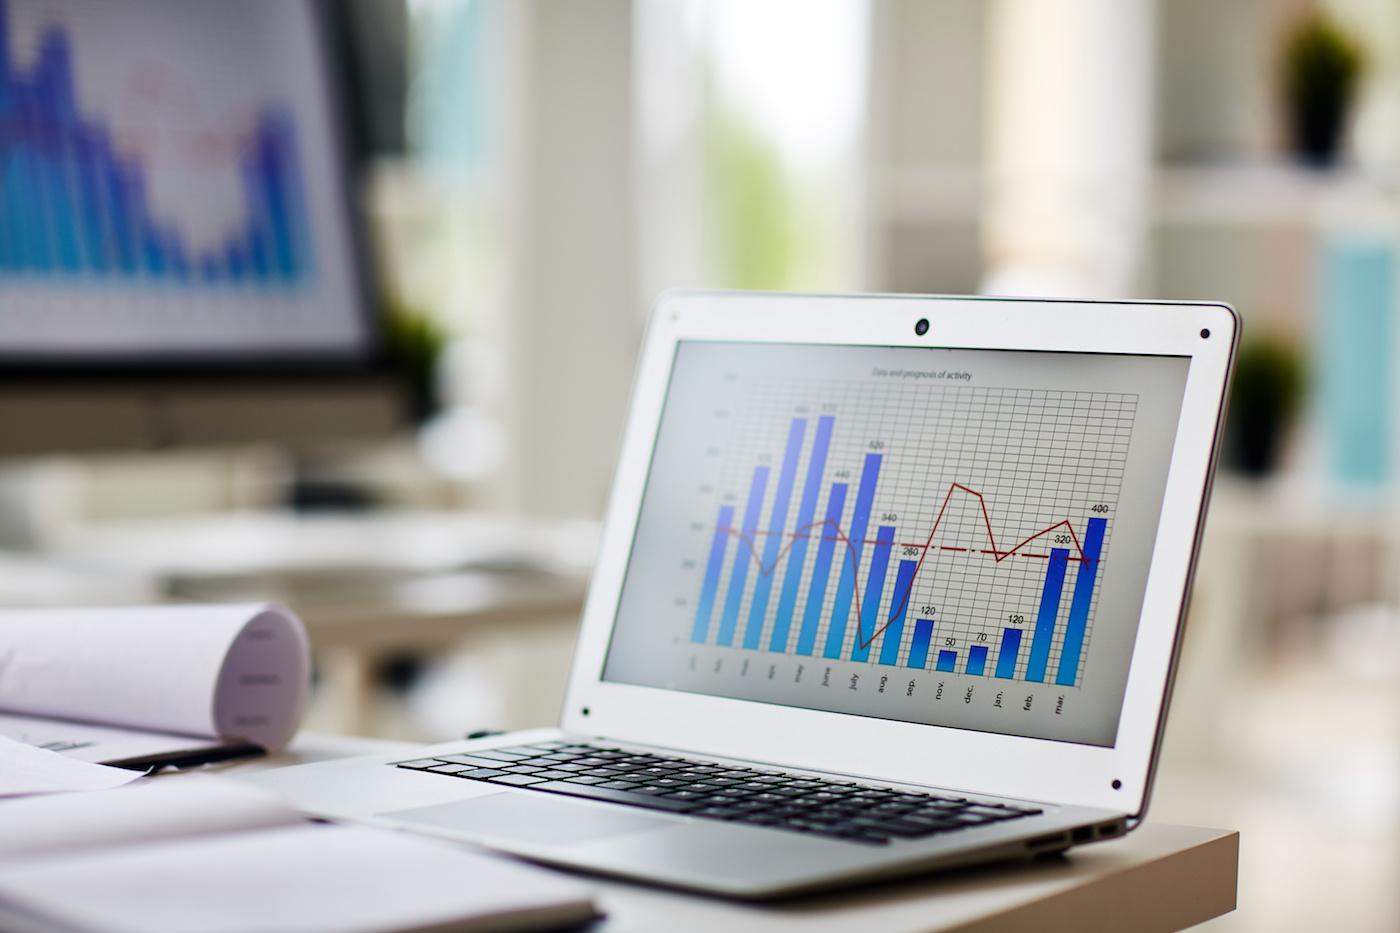 digital-graph-laptop